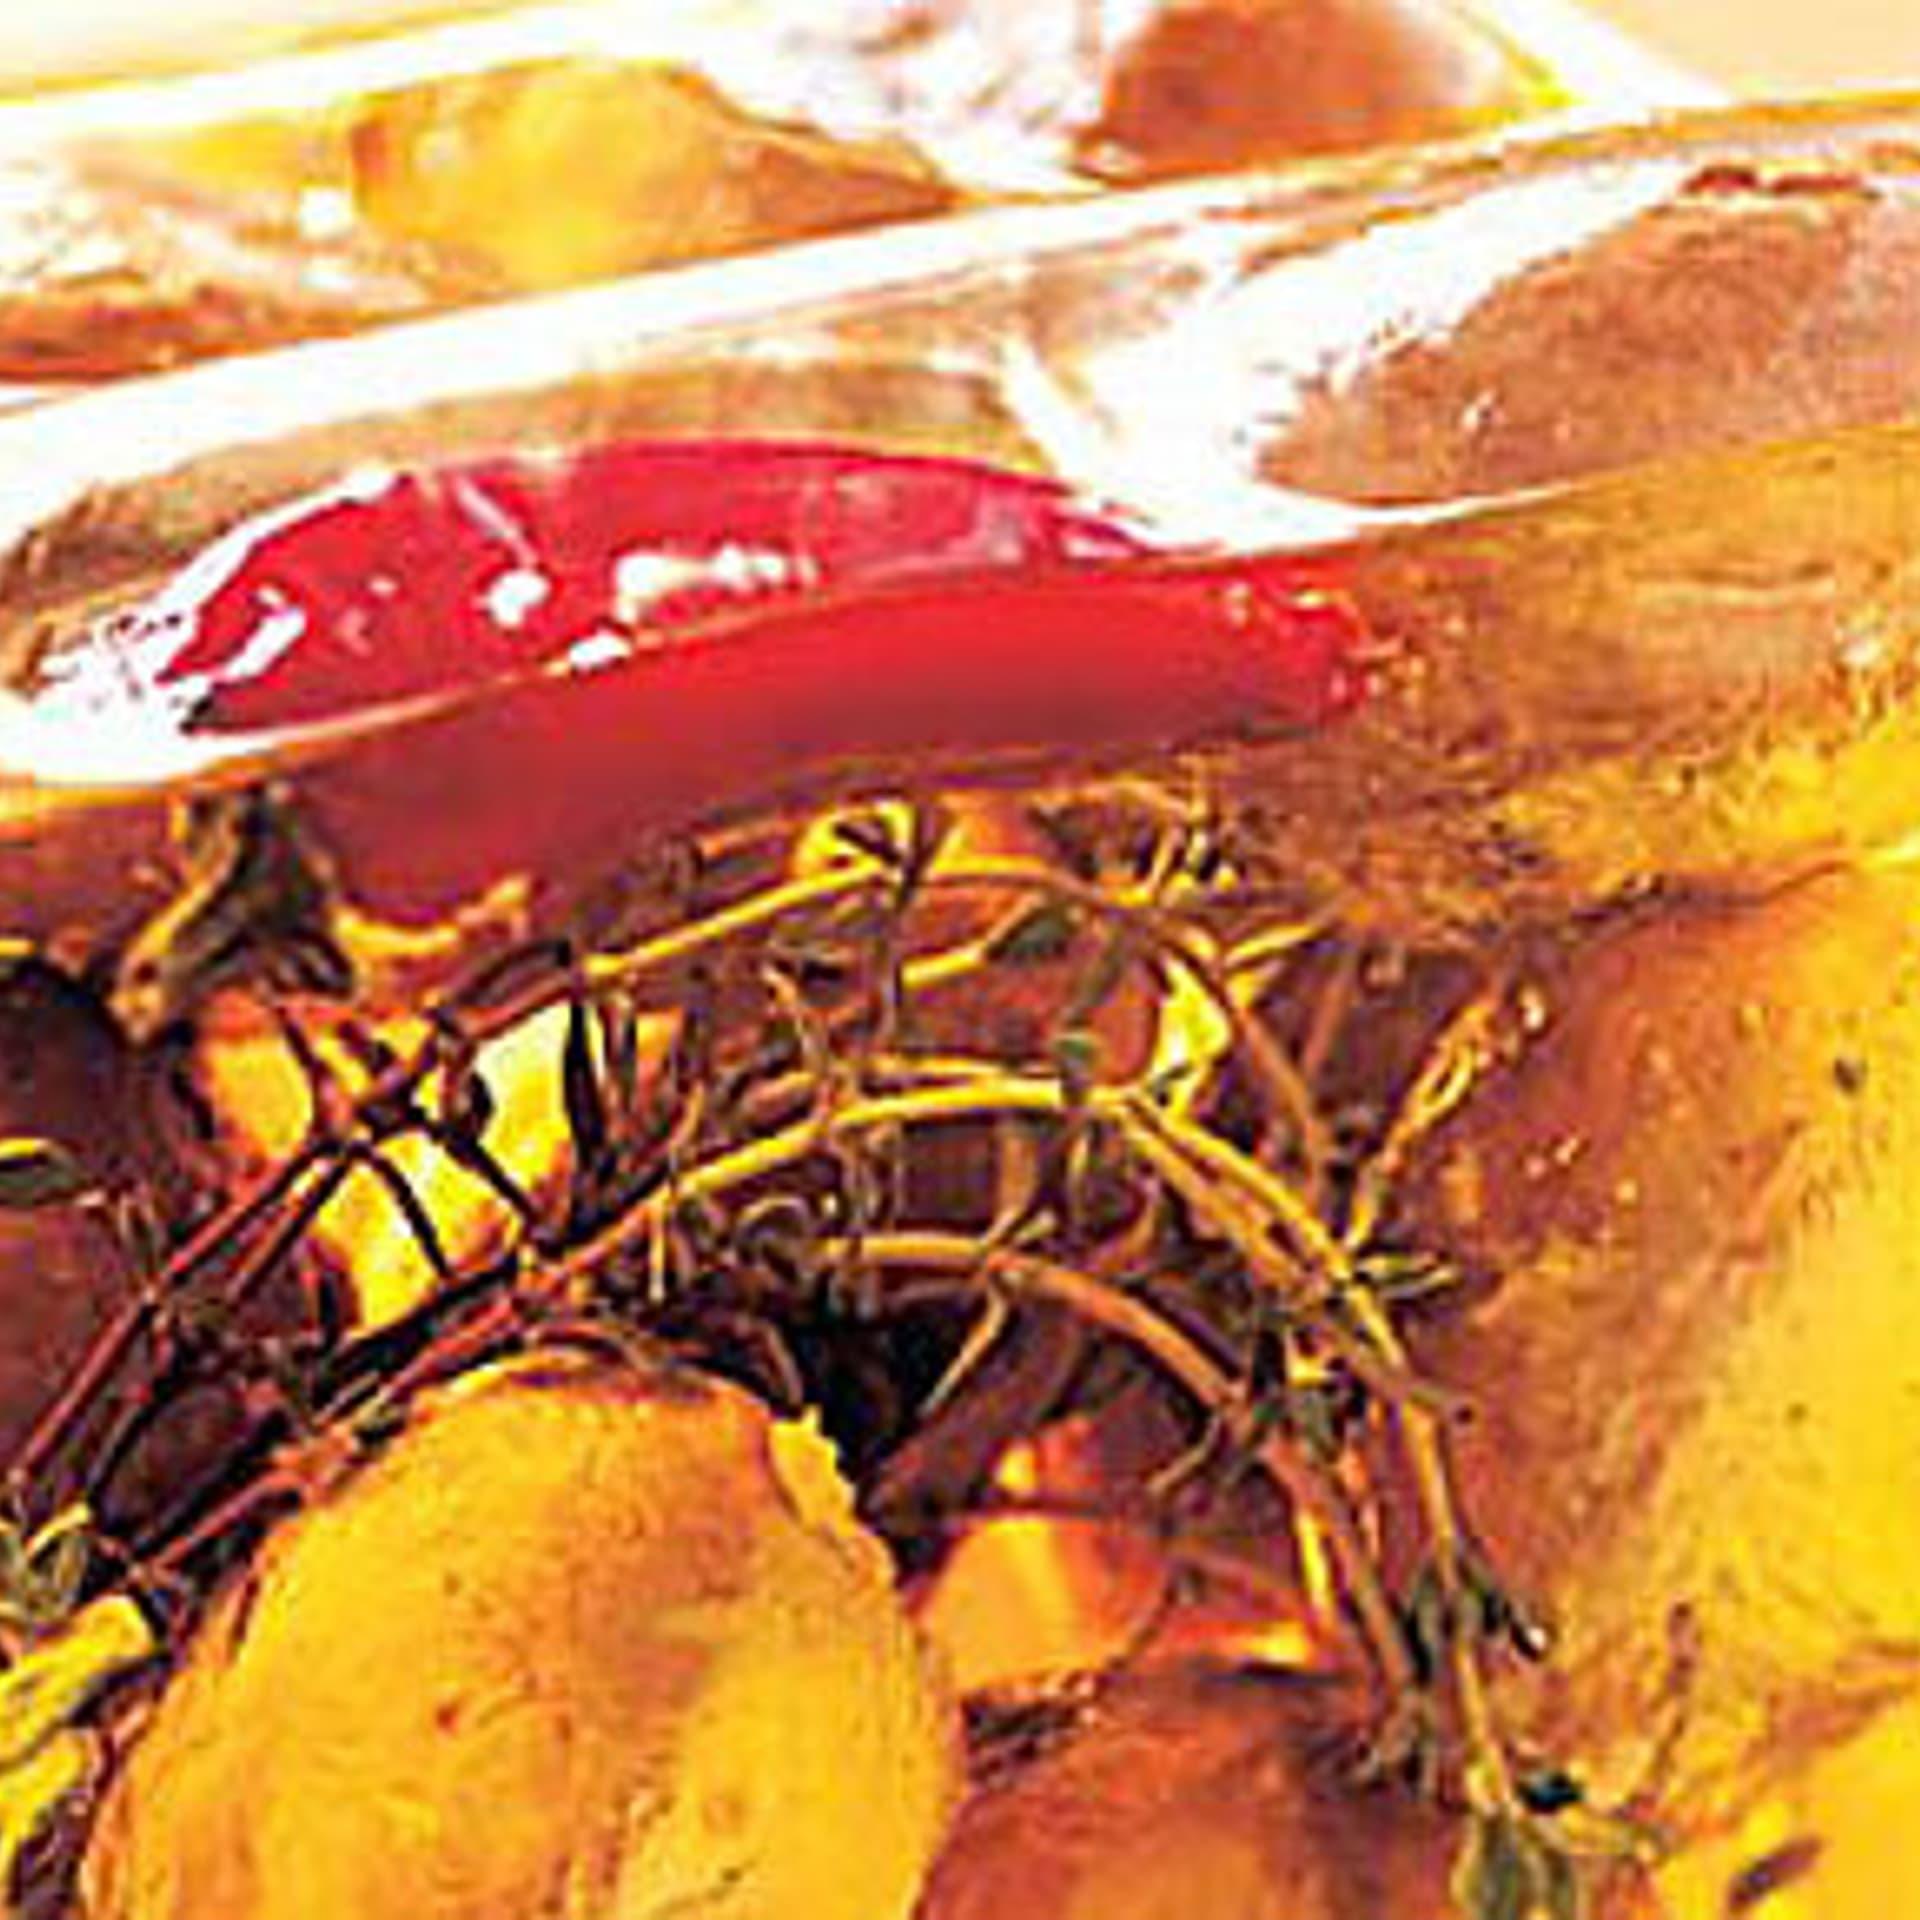 Champignons mit frischkaese in oel